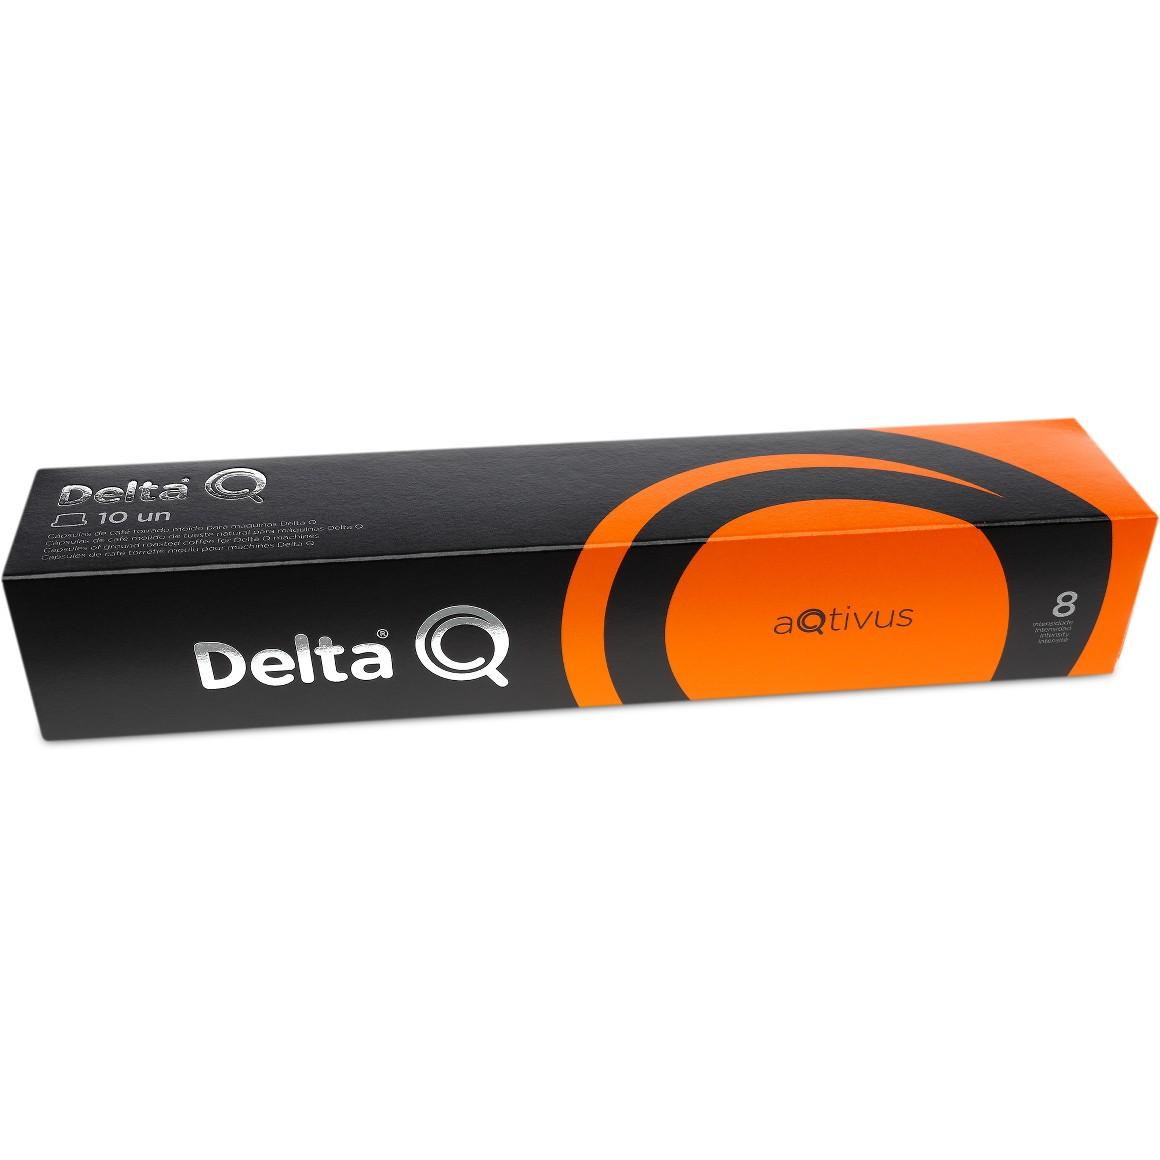 Cápsula de Café Delta Q Aqtivus Intensidade 8 - 10 Cápsulas